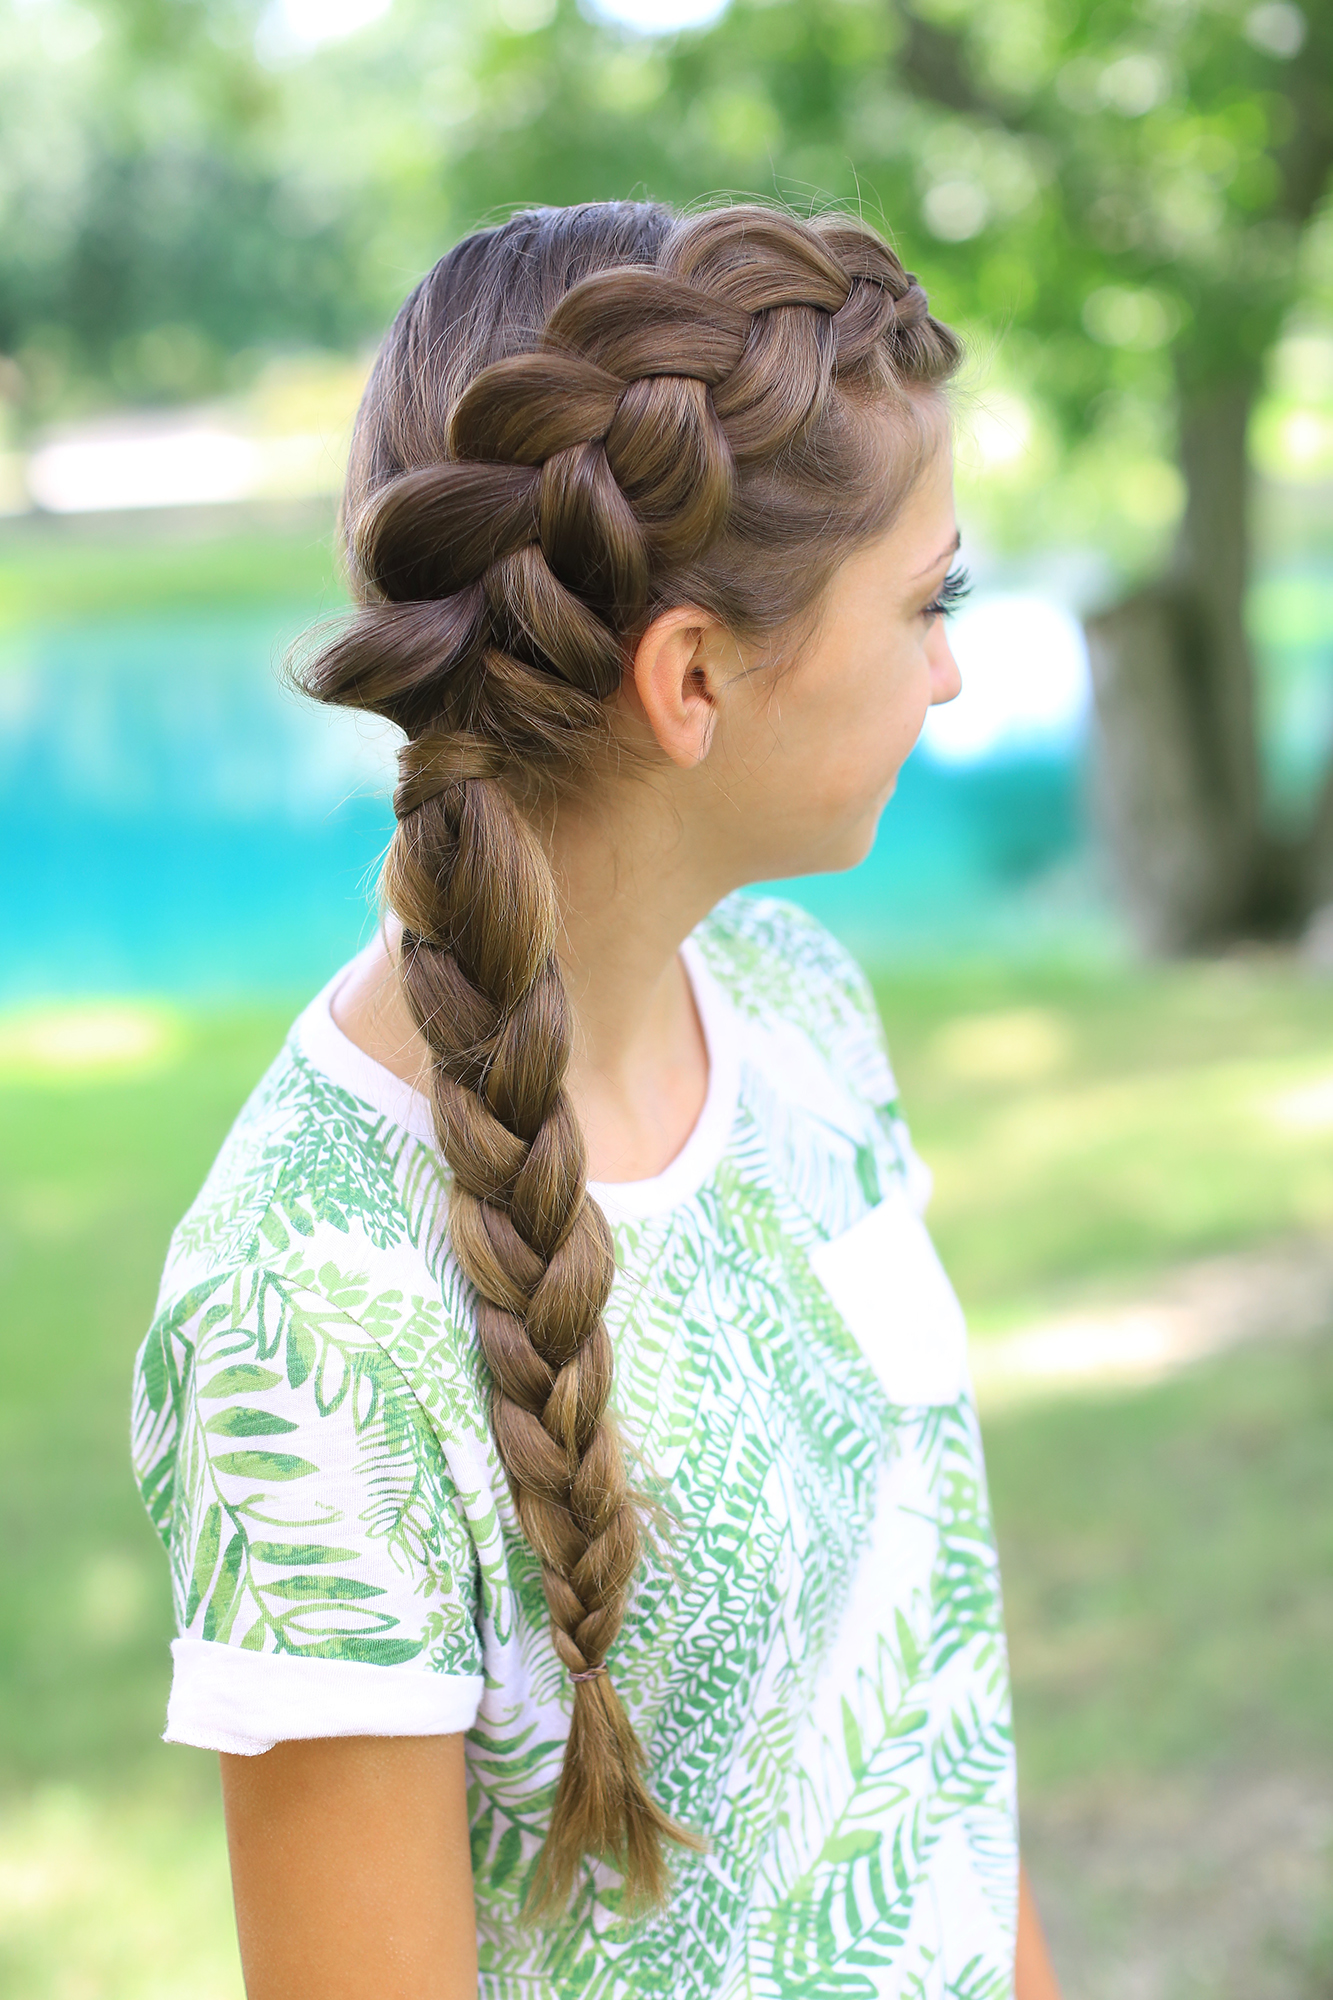 hairstyles cute dutch braid side combo braids hair easy braided hairstyle bun cutegirlshairstyles styles ponytail double cool everyday